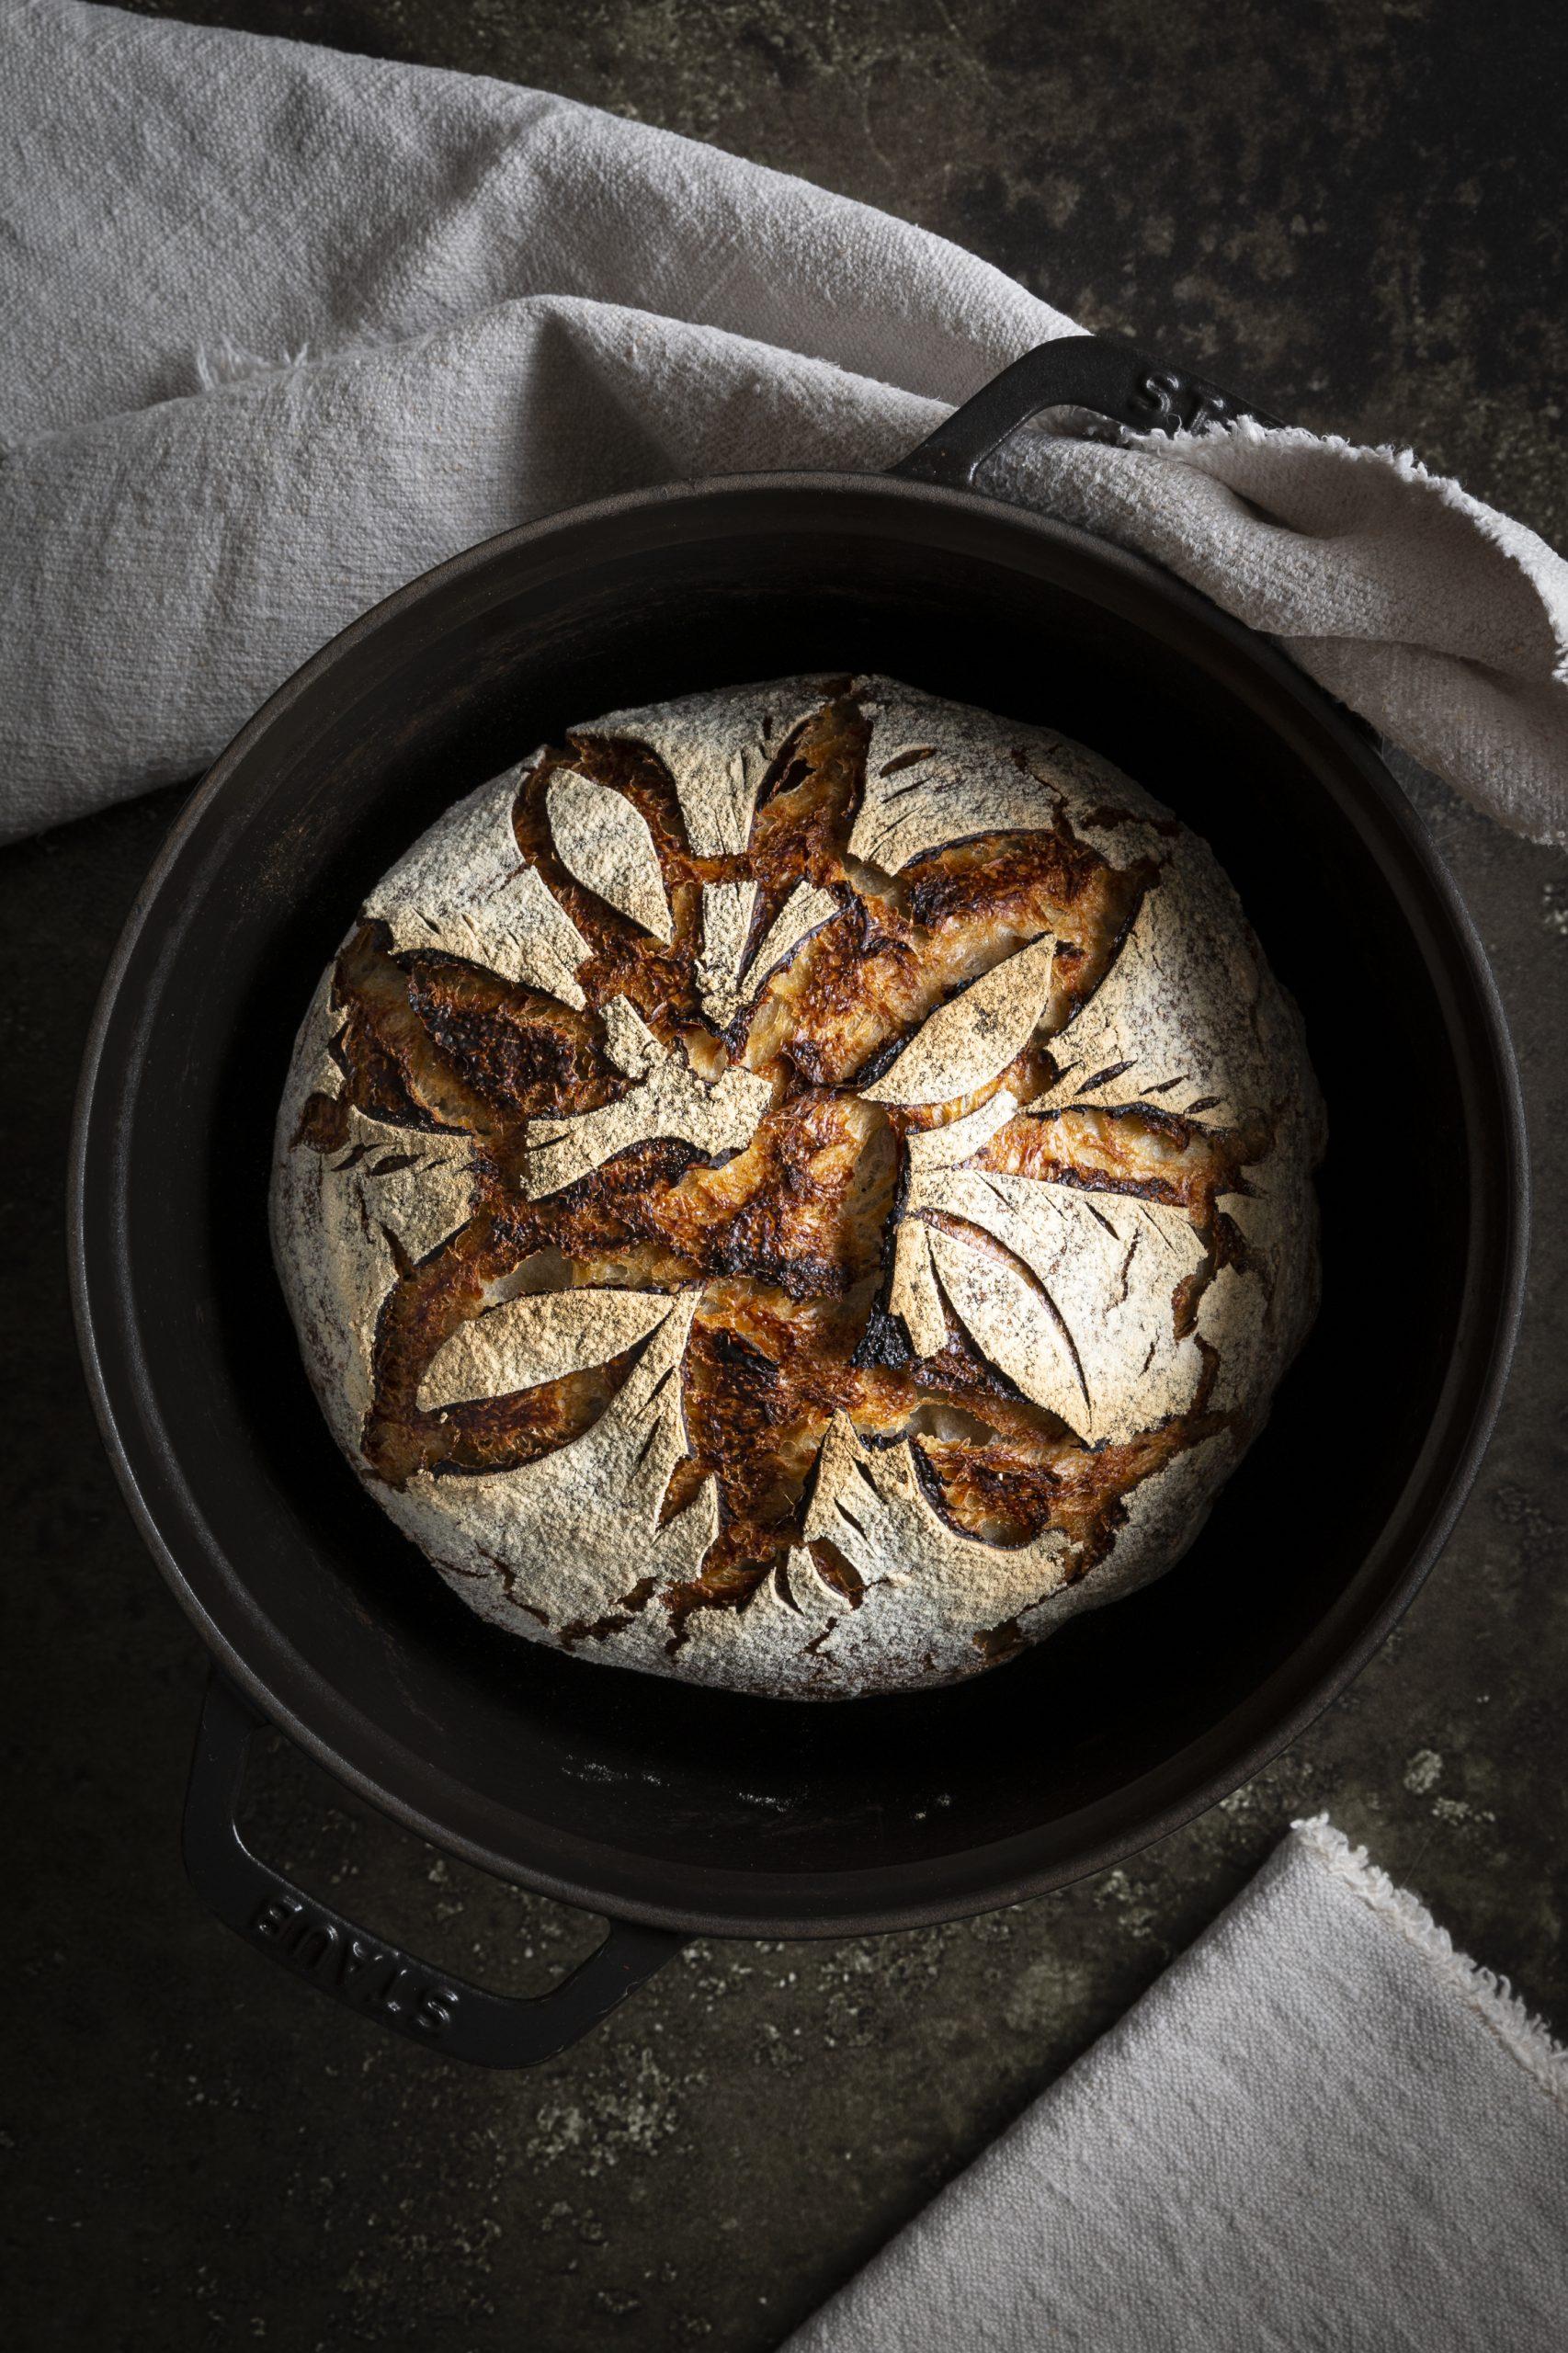 Weizensauerteig_Brot